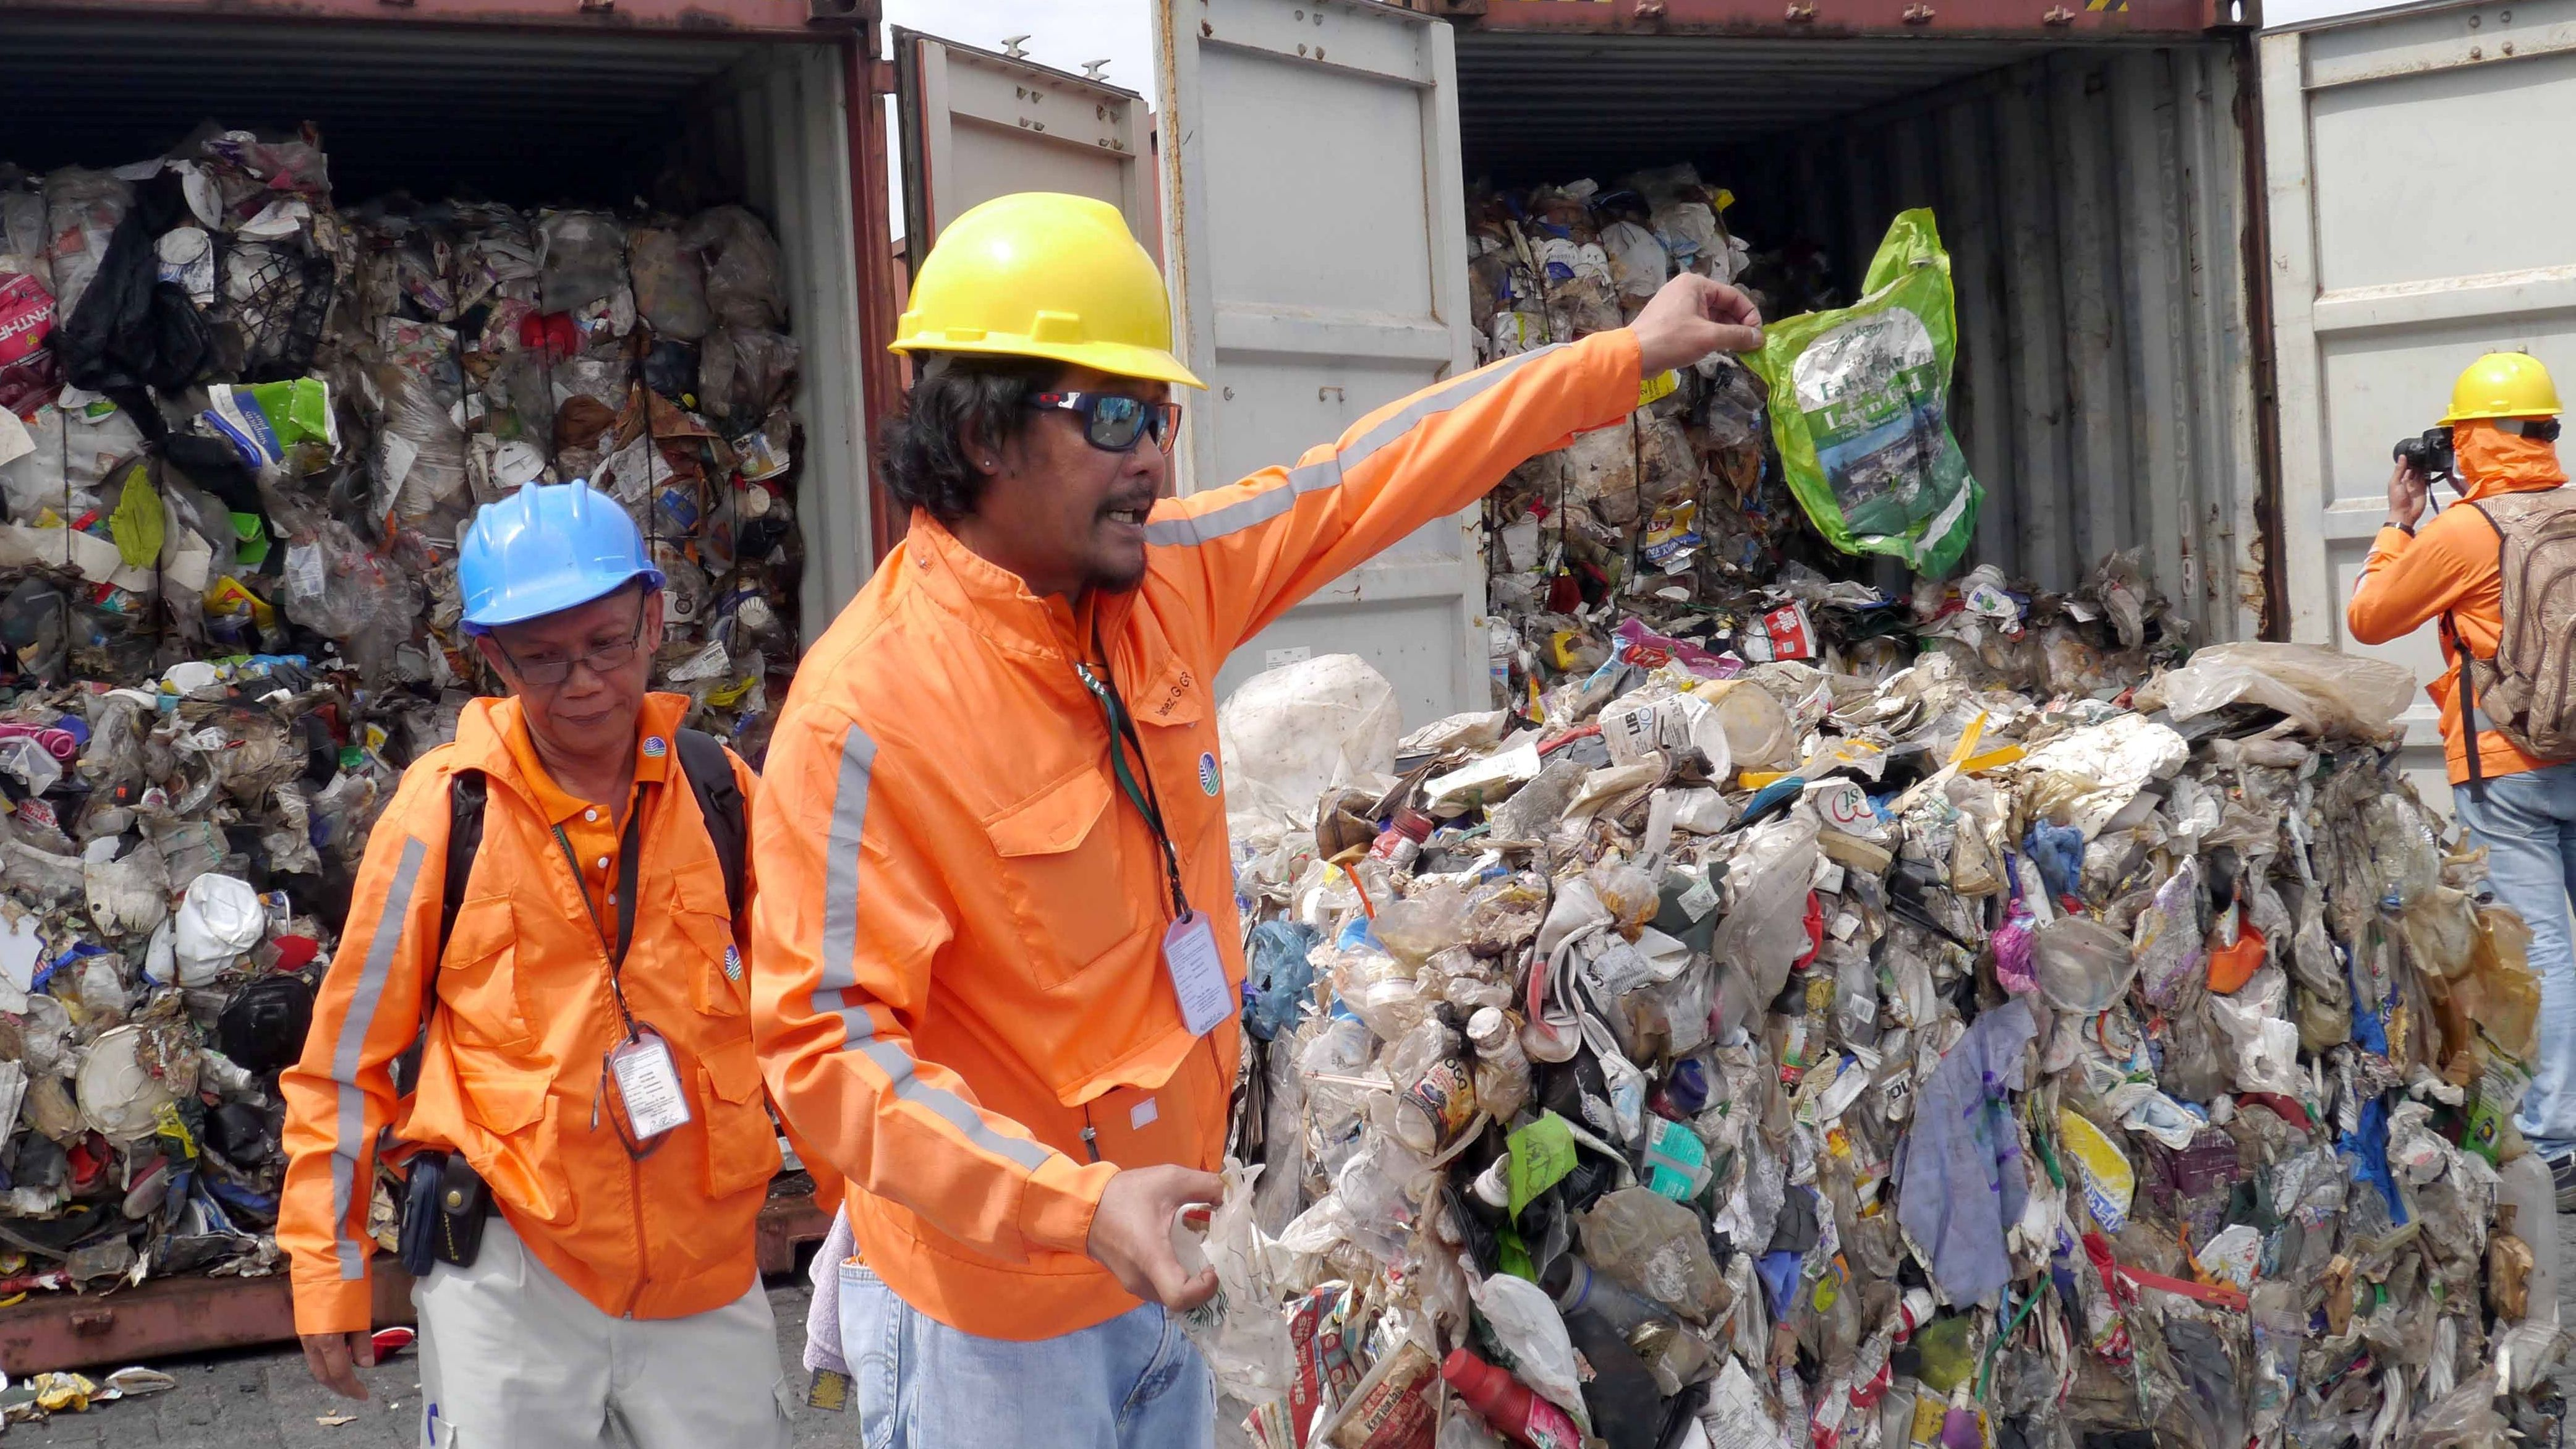 Philippinische Zollbeamte inspizieren Abfälle aus Kanada